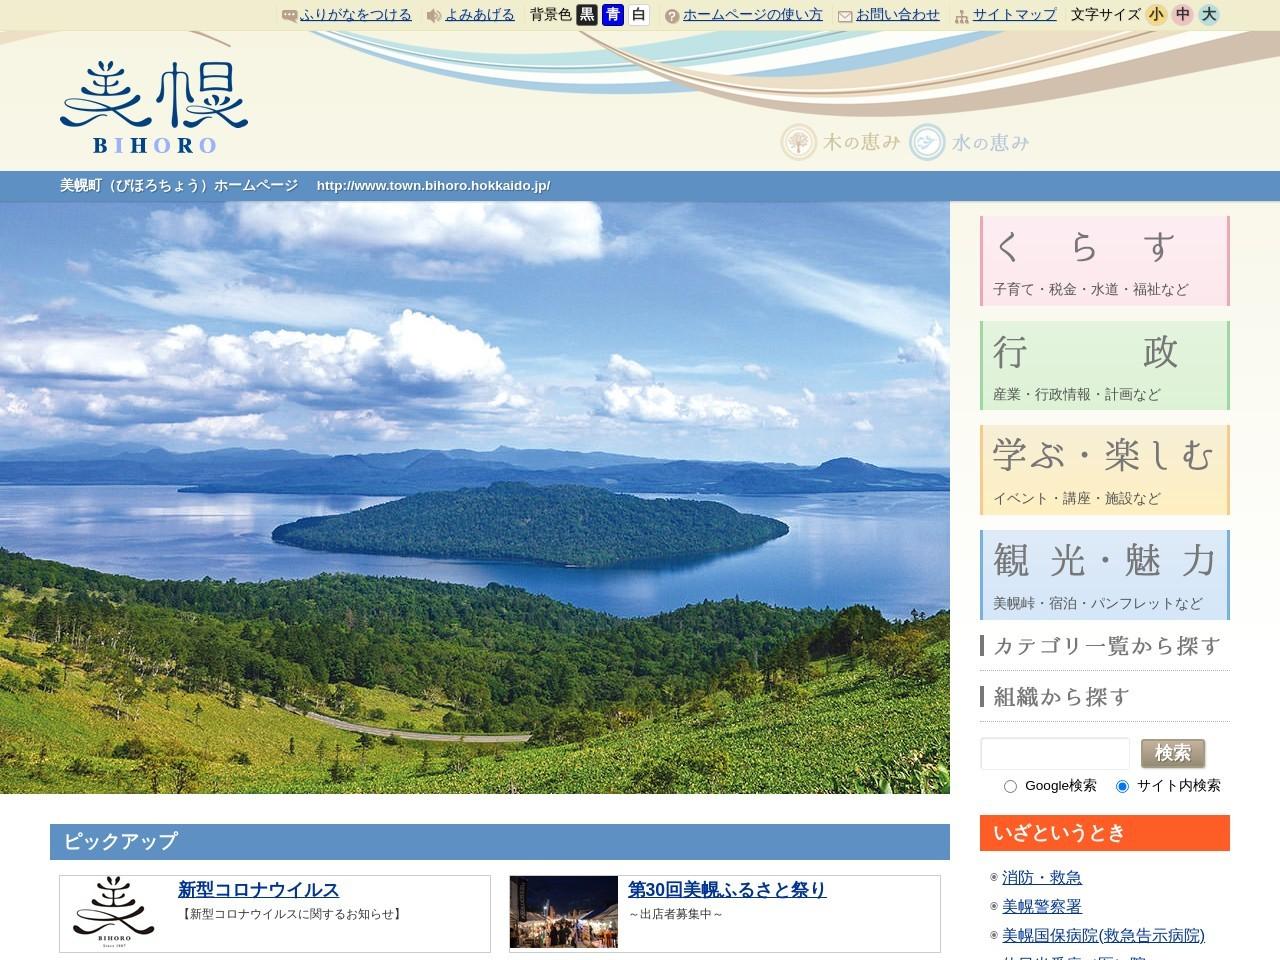 http://www.town.bihoro.hokkaido.jp/